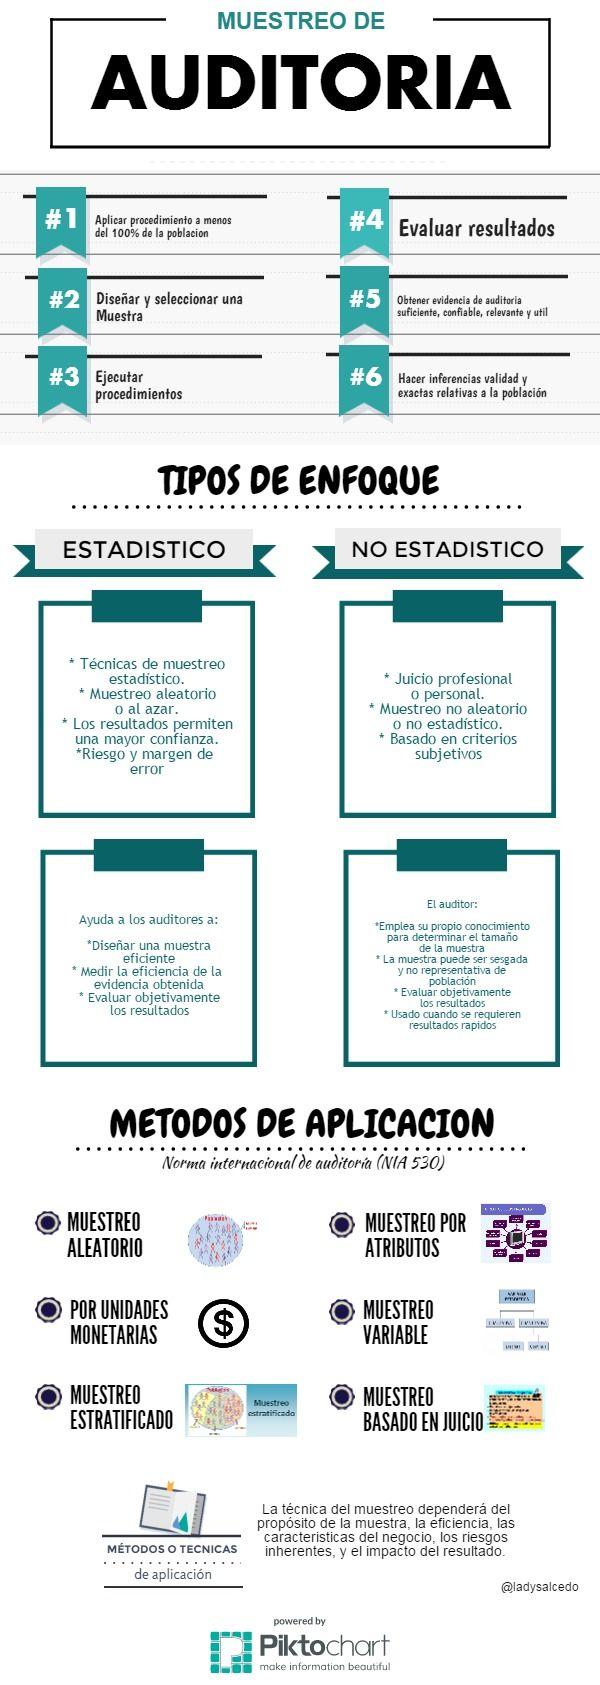 Muestreo de auditoria   Piktochart Infographic Editor